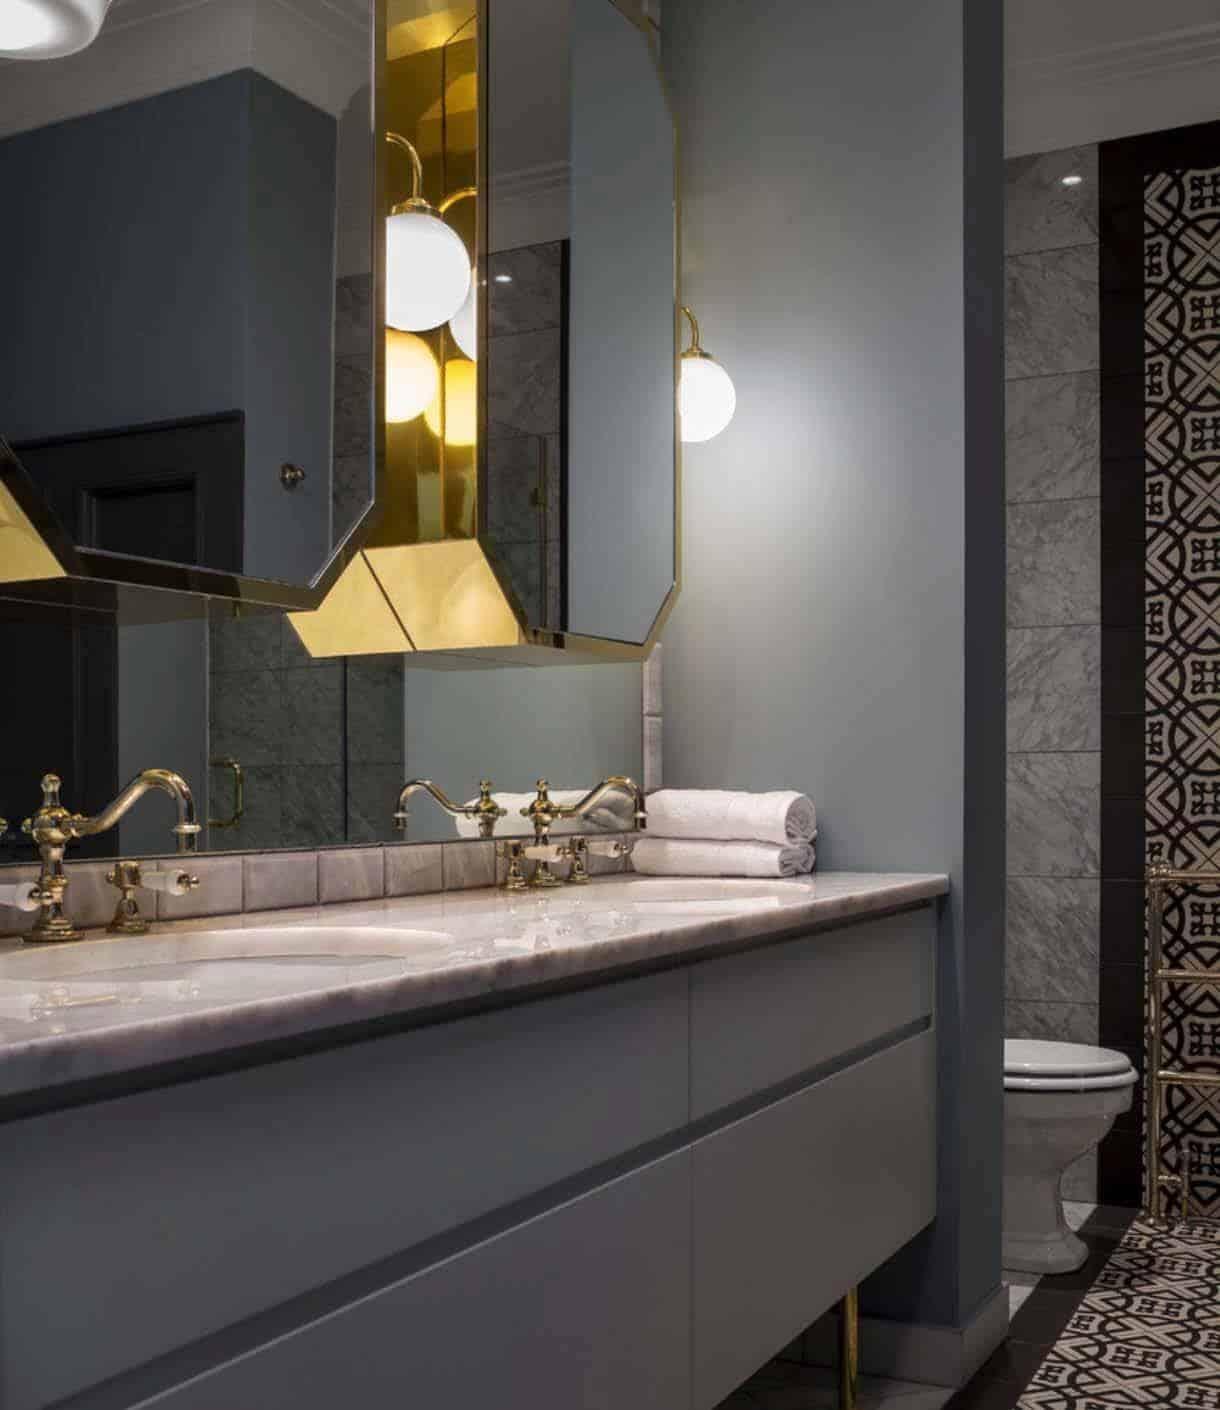 Maison familiale contemporaine-Kingston Lafferty Design-10-1 Kindesign